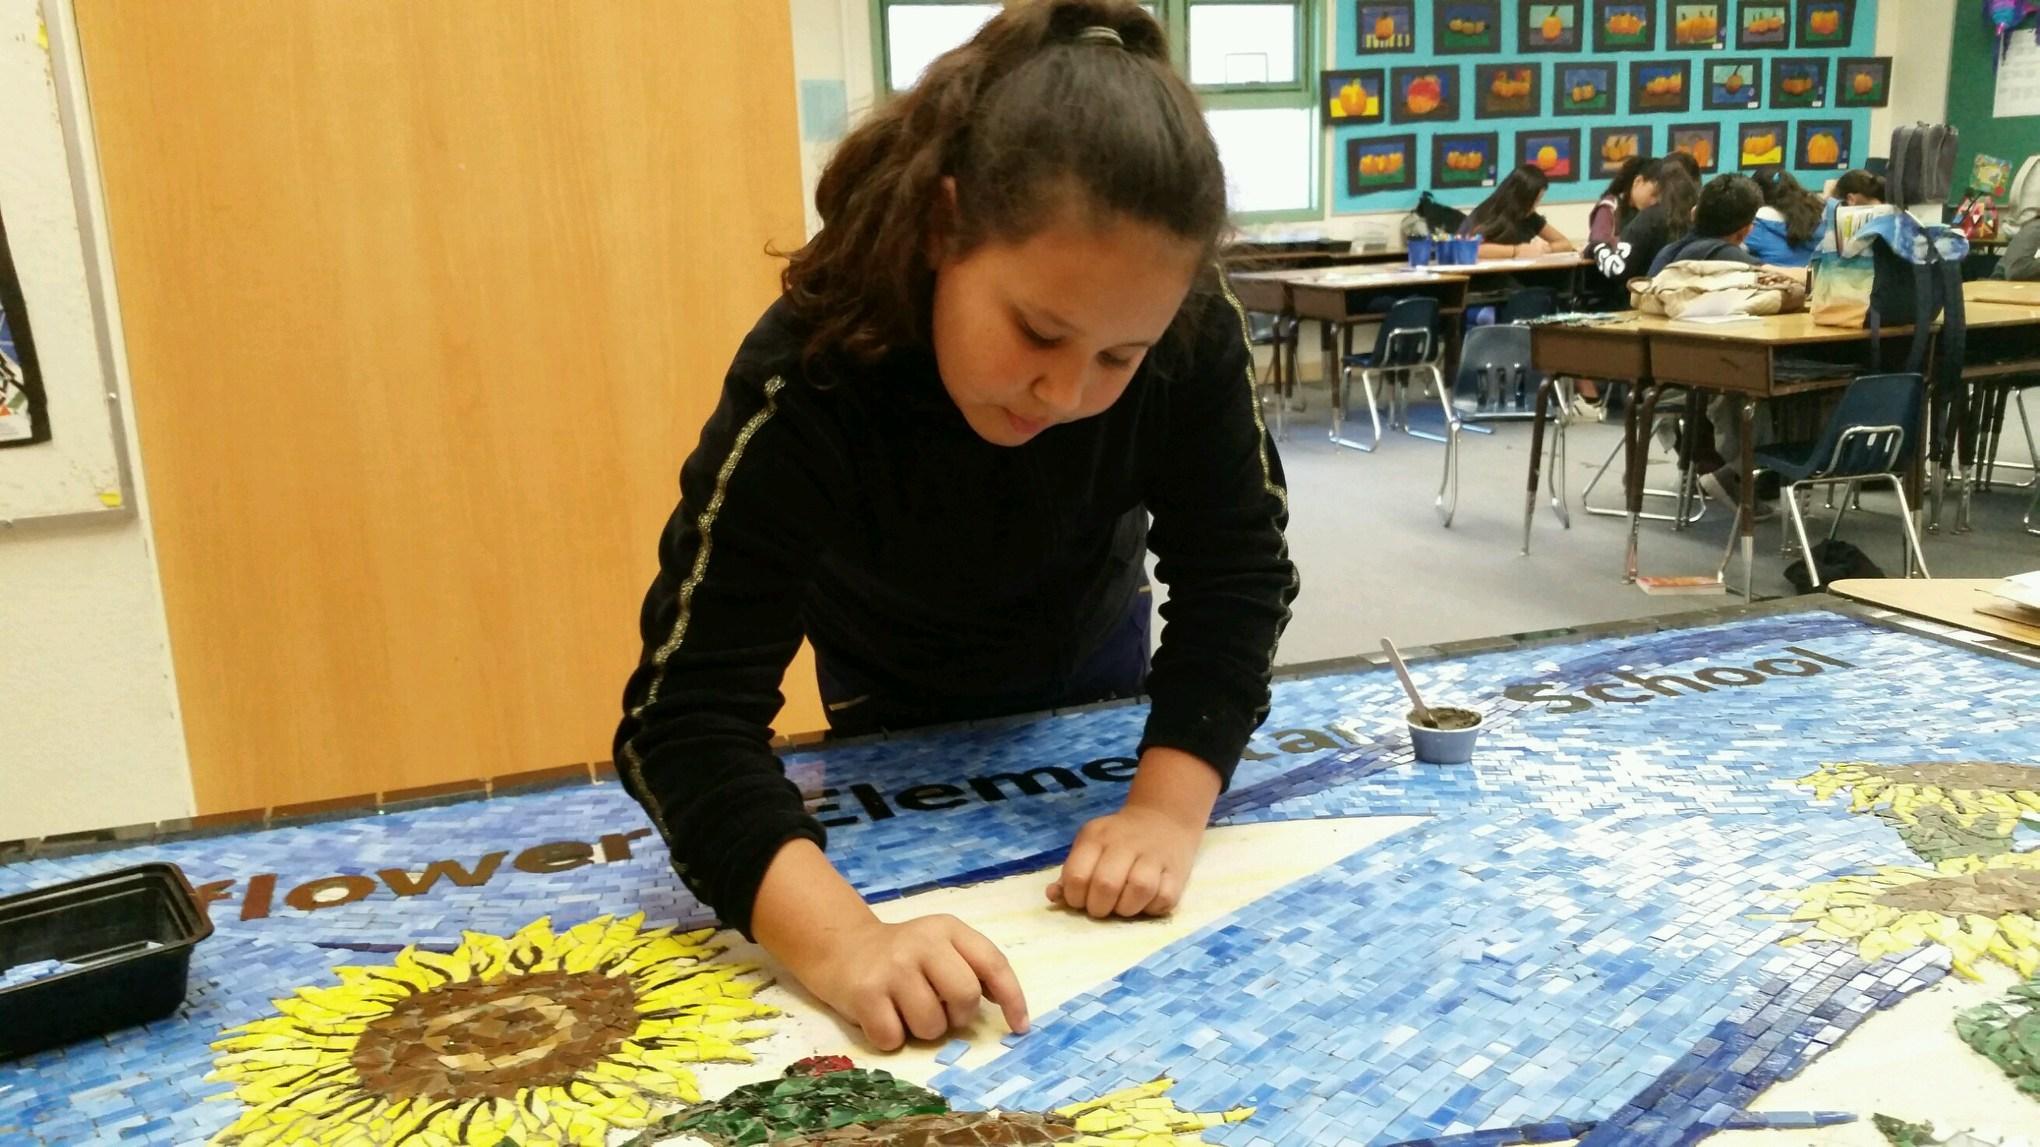 Ases Home Ases Sunflower Elementary School